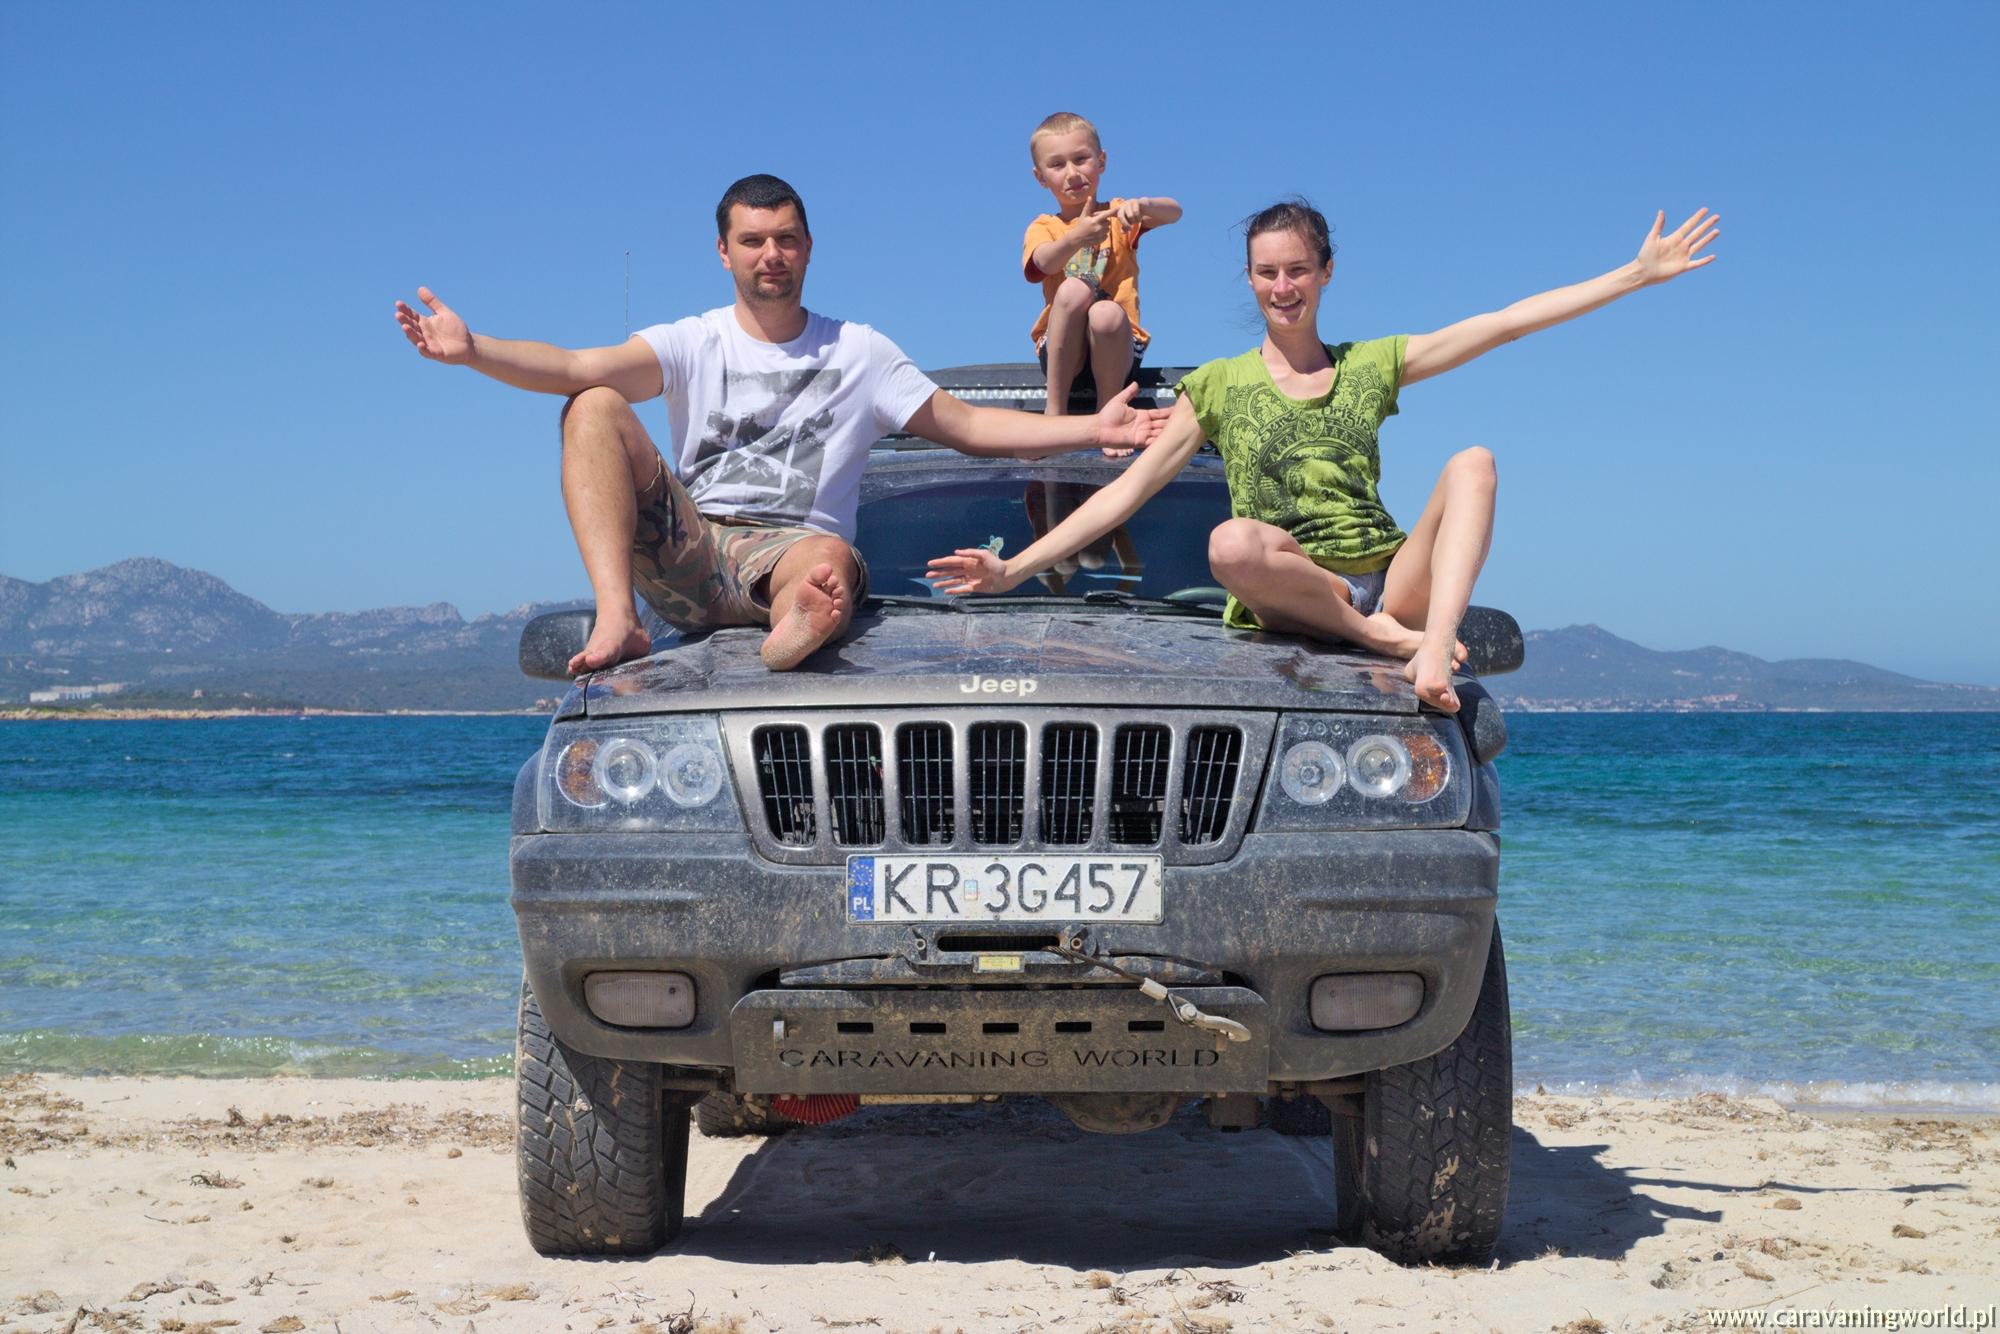 Caravaningowy jeep